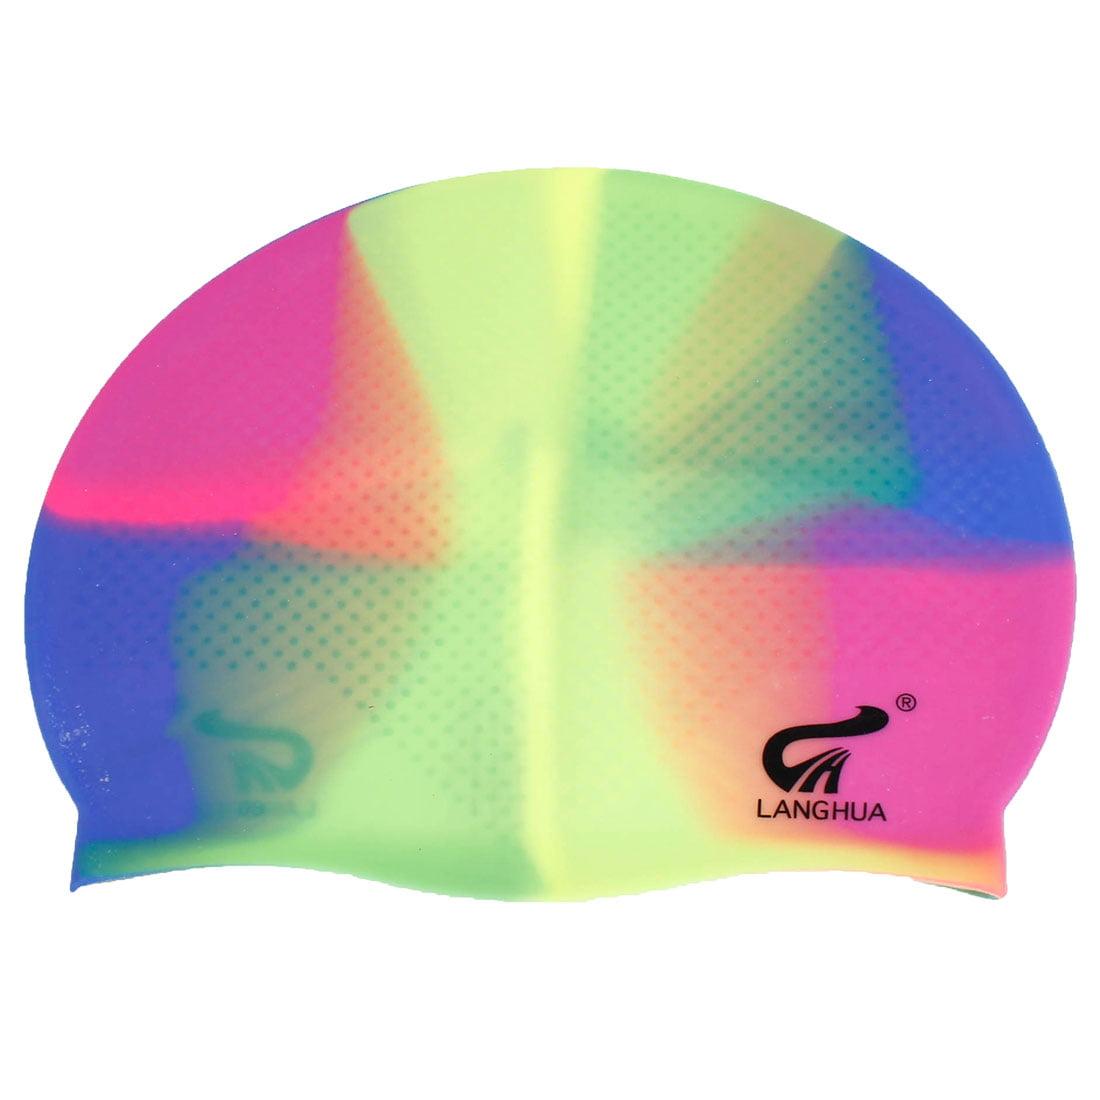 Unique Bargains Women Men Assorted Color Soft Silicone Elastic Swimming Hat Cap